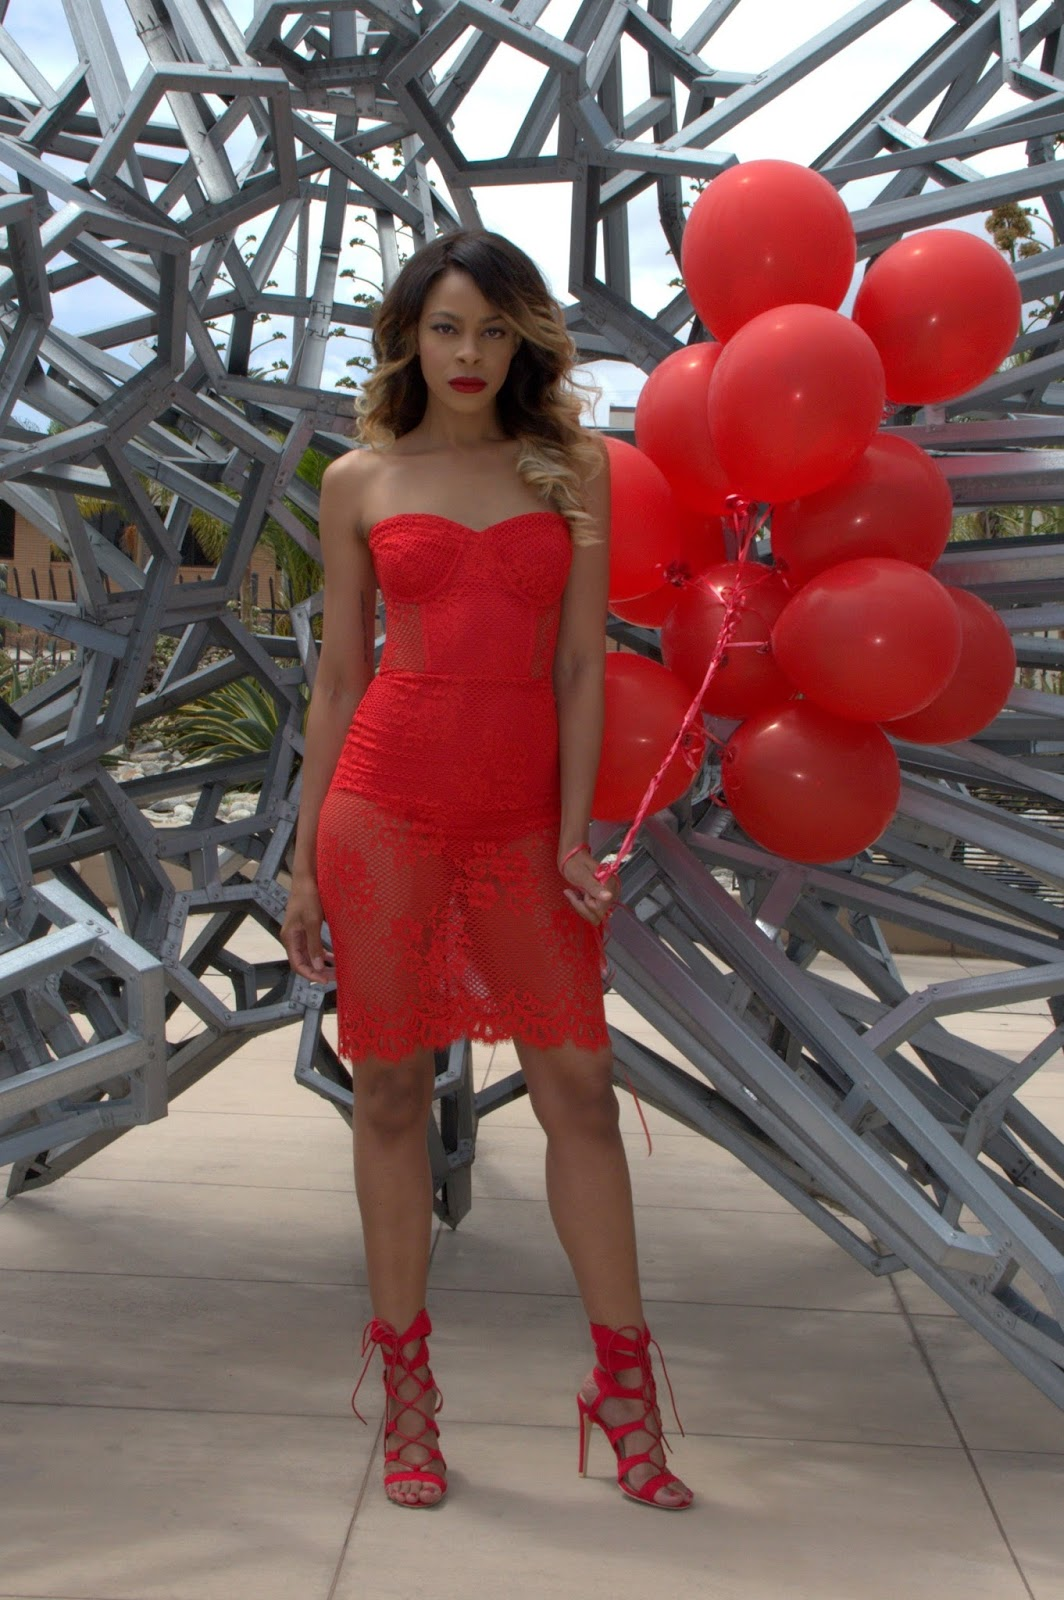 shayla drake, shayla greene, allthingsslim, red lace dress